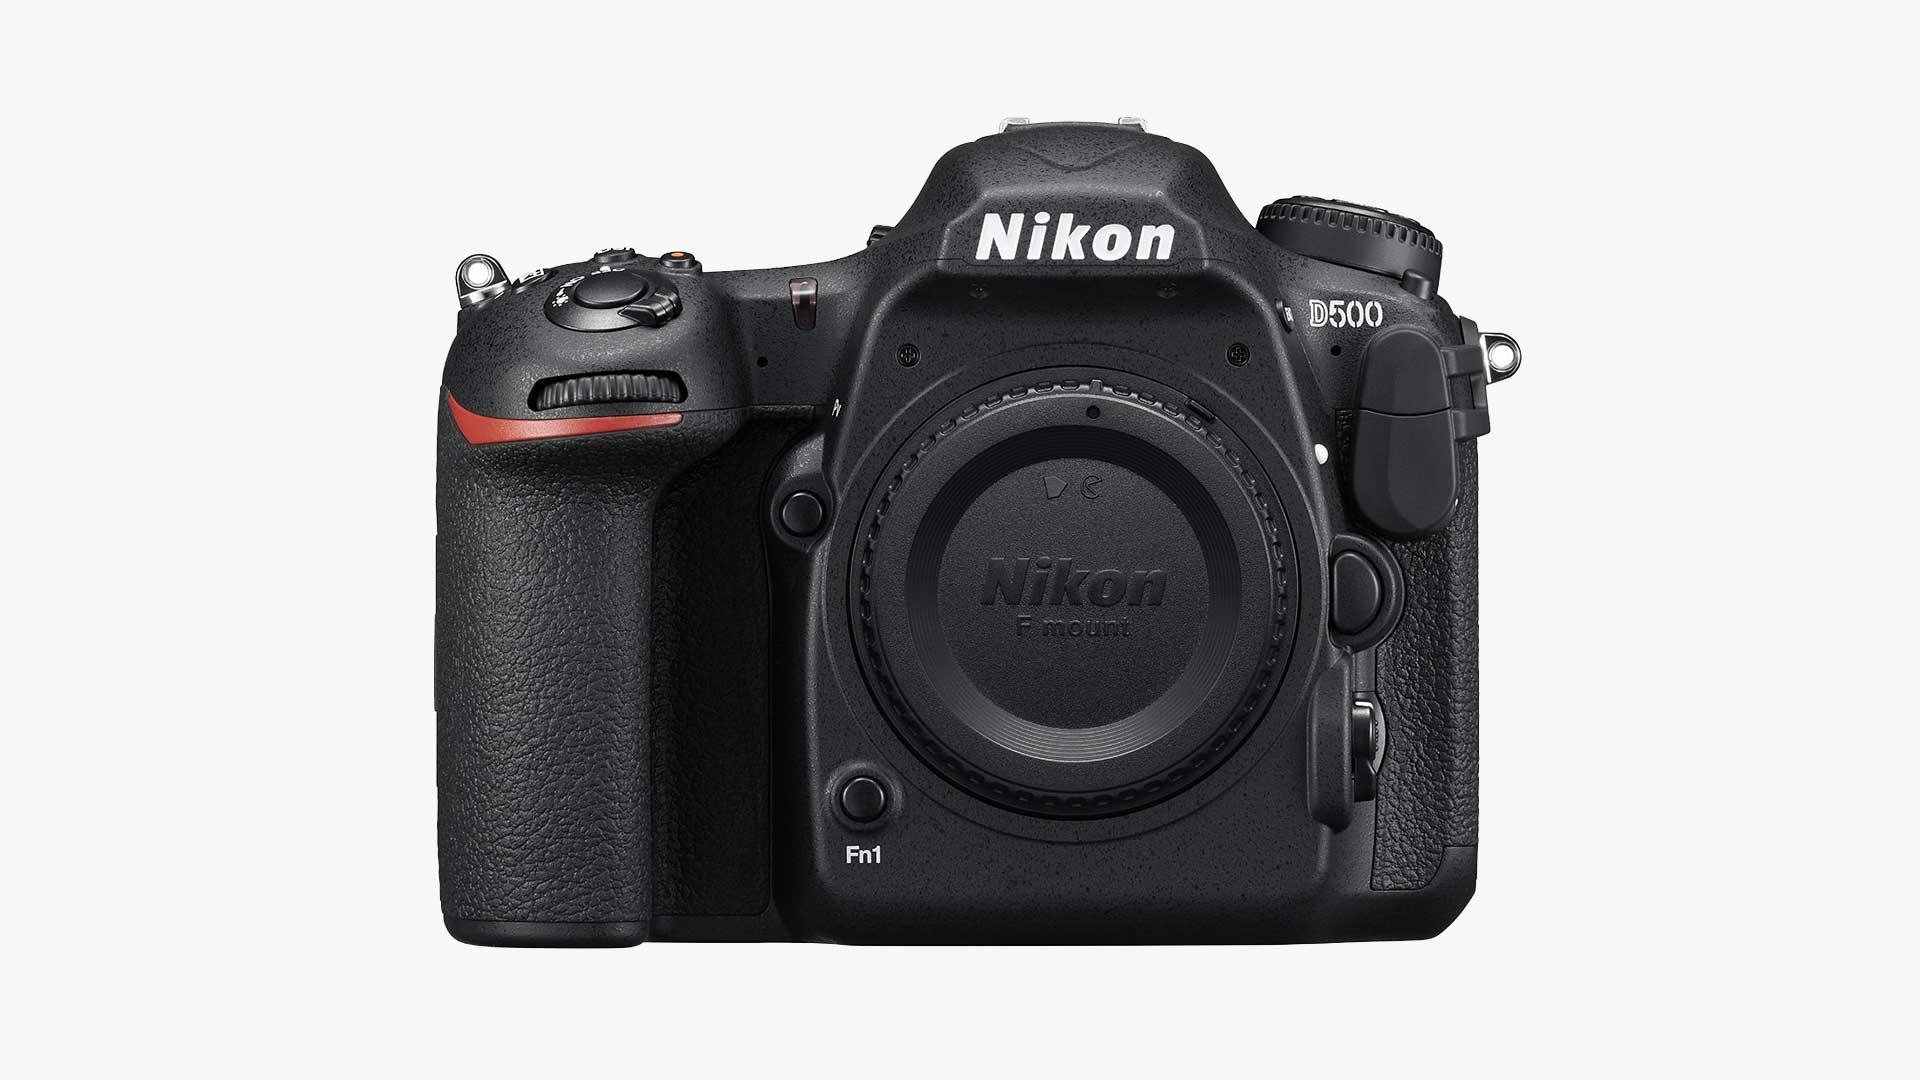 Nikon D500 DX-Format Digital SLR